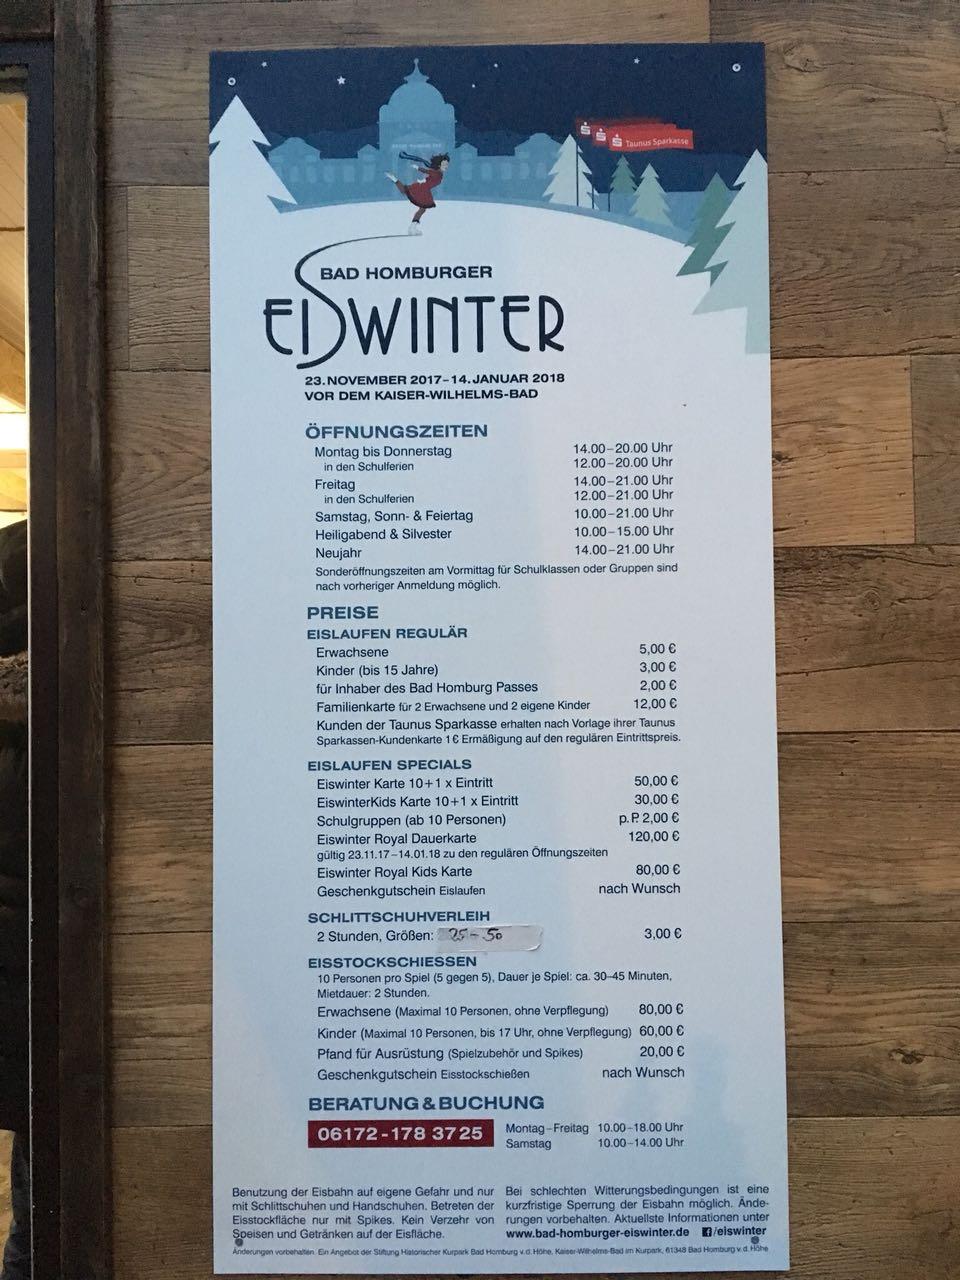 Eislaufbahn Preise Bad Homburg bei Frankfurt